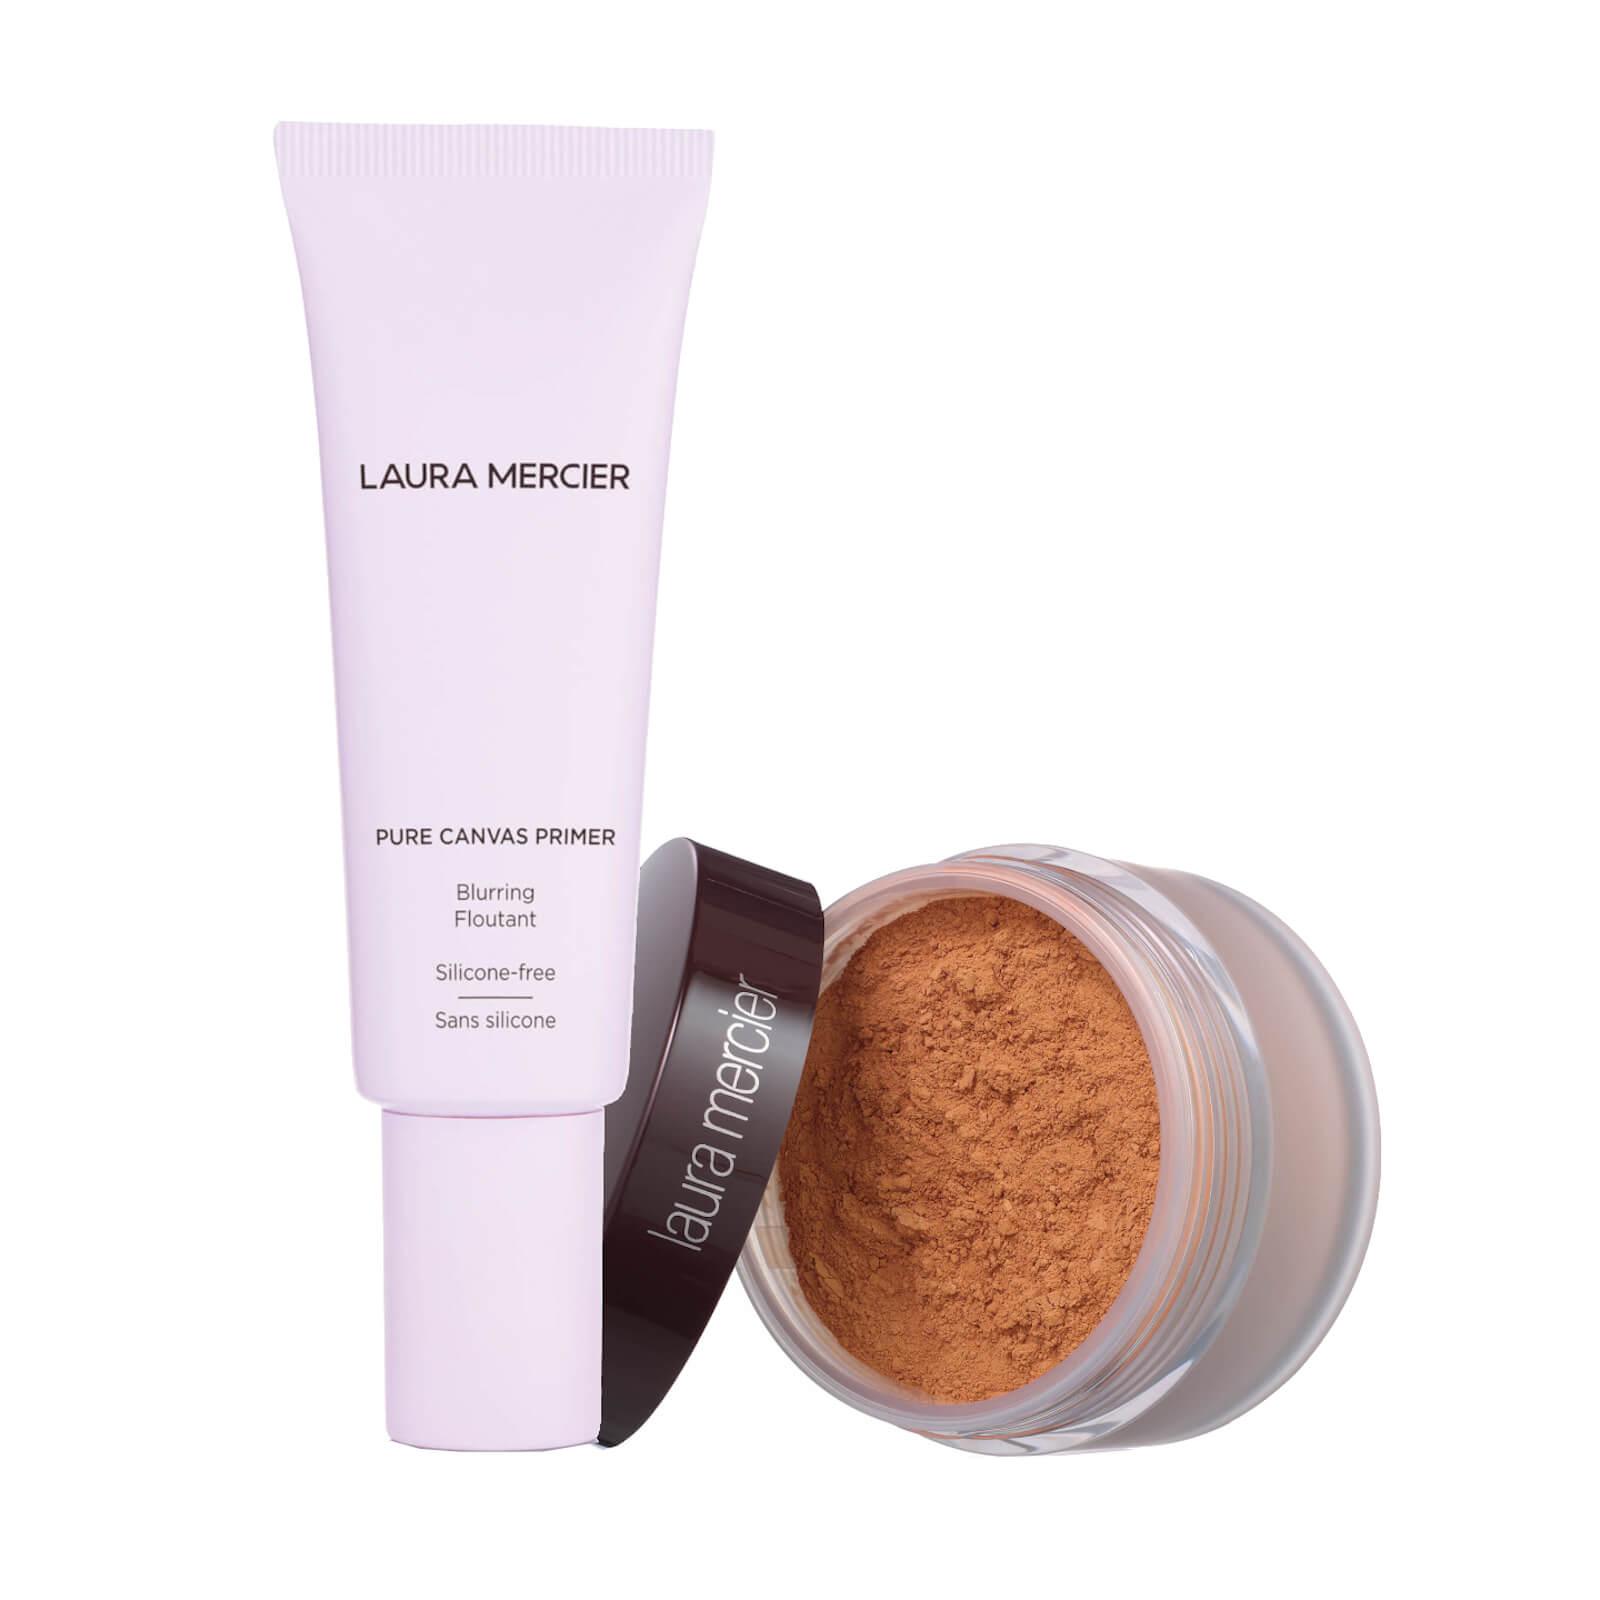 Laura Mercier Pure Canvas Primer- Blurring and Translucent Loose Setting Powder (Various Shades) - Medium Deep